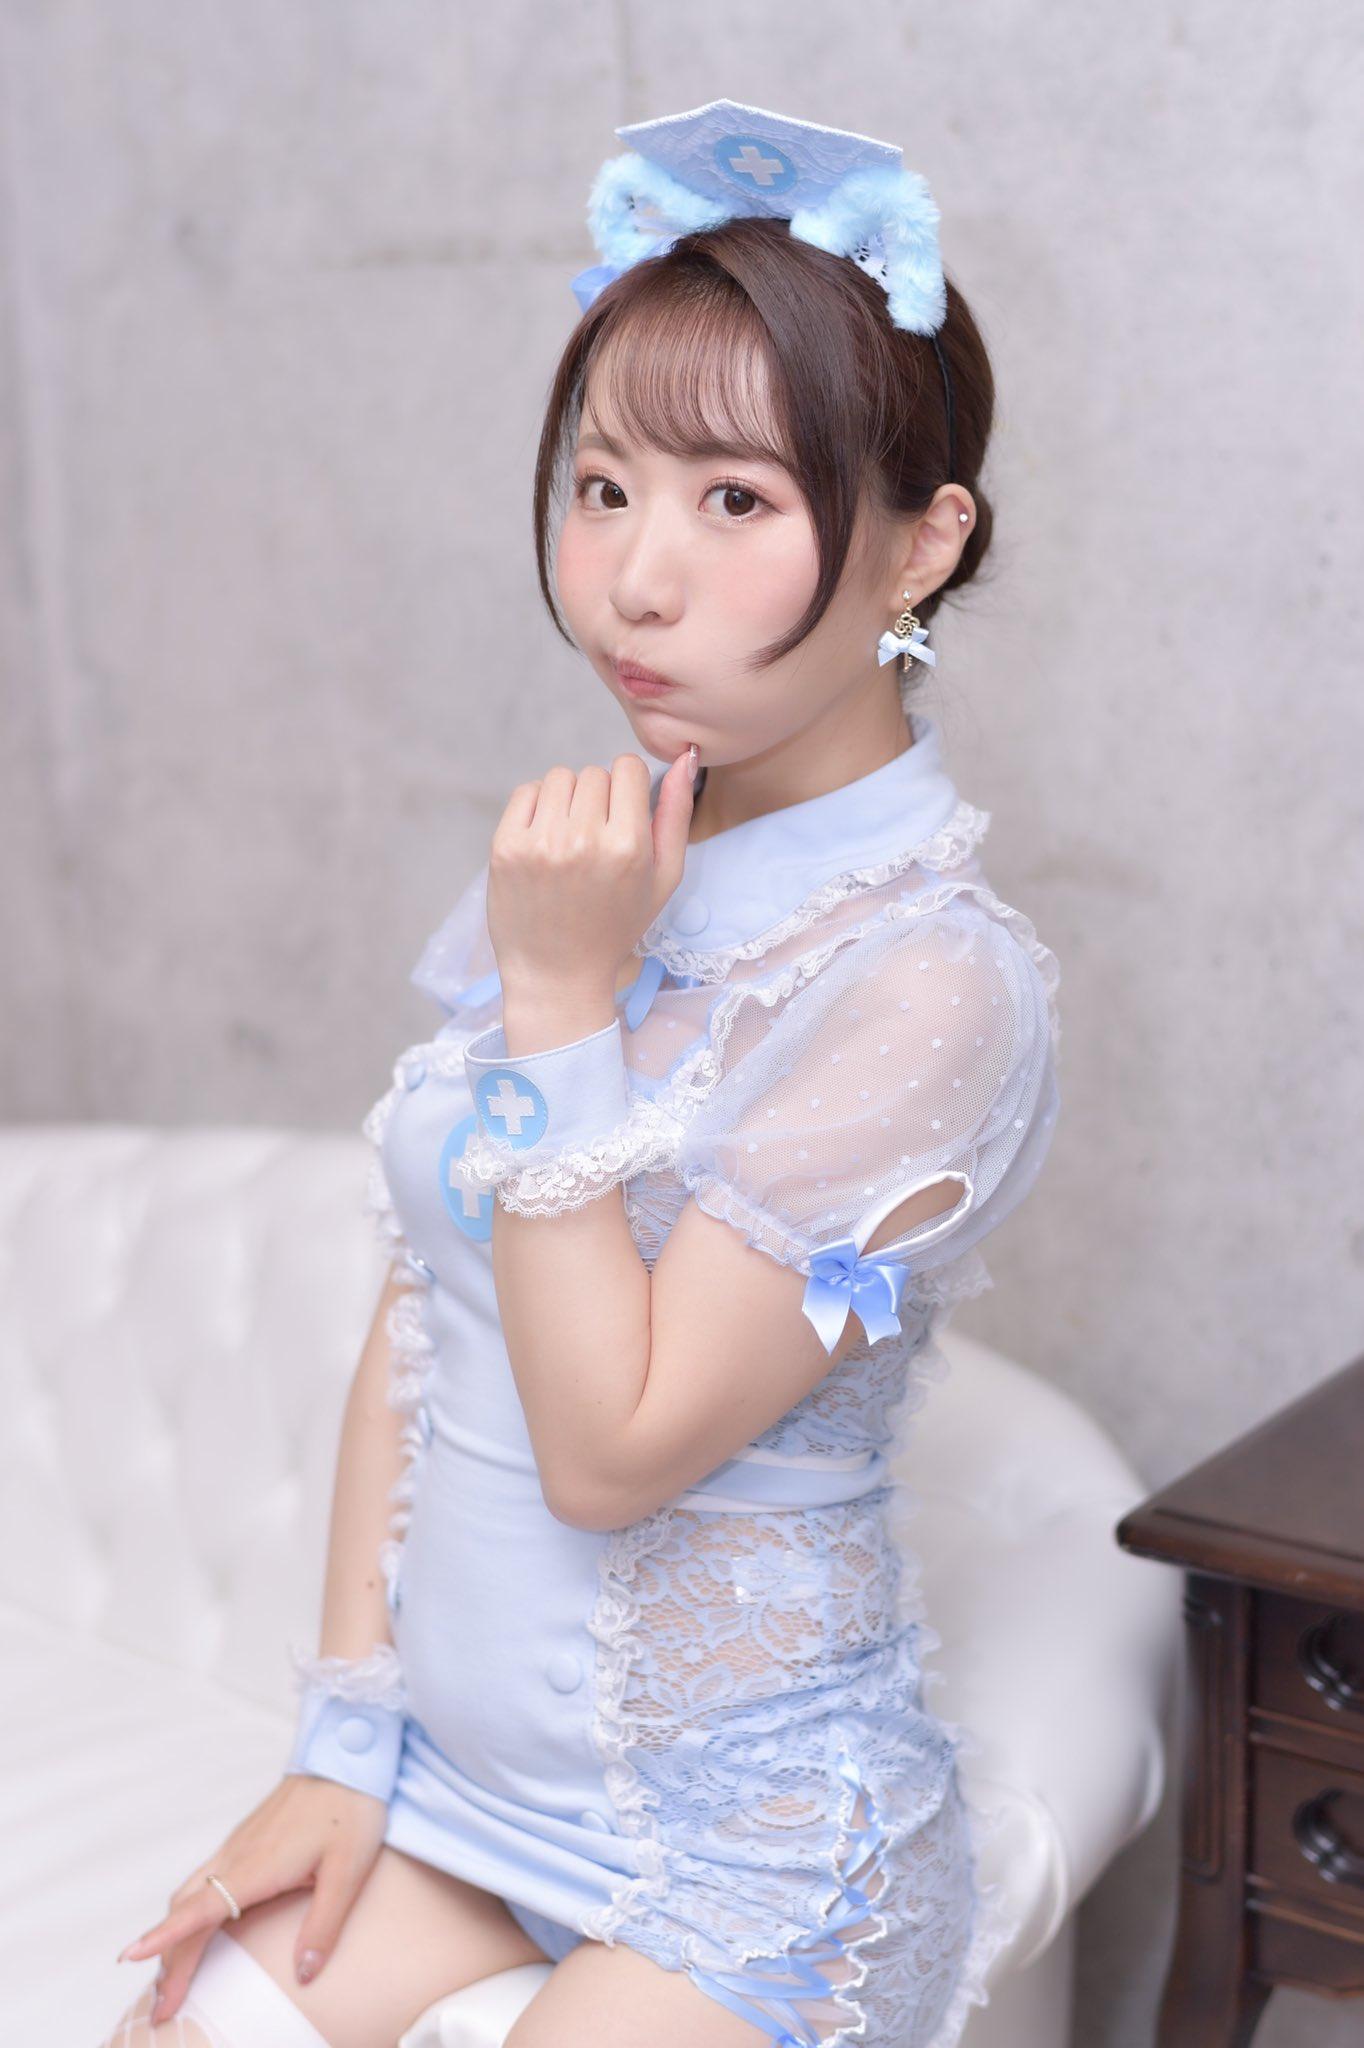 rogufuku-1429777752647823365-20210823_200914-img3.jpg